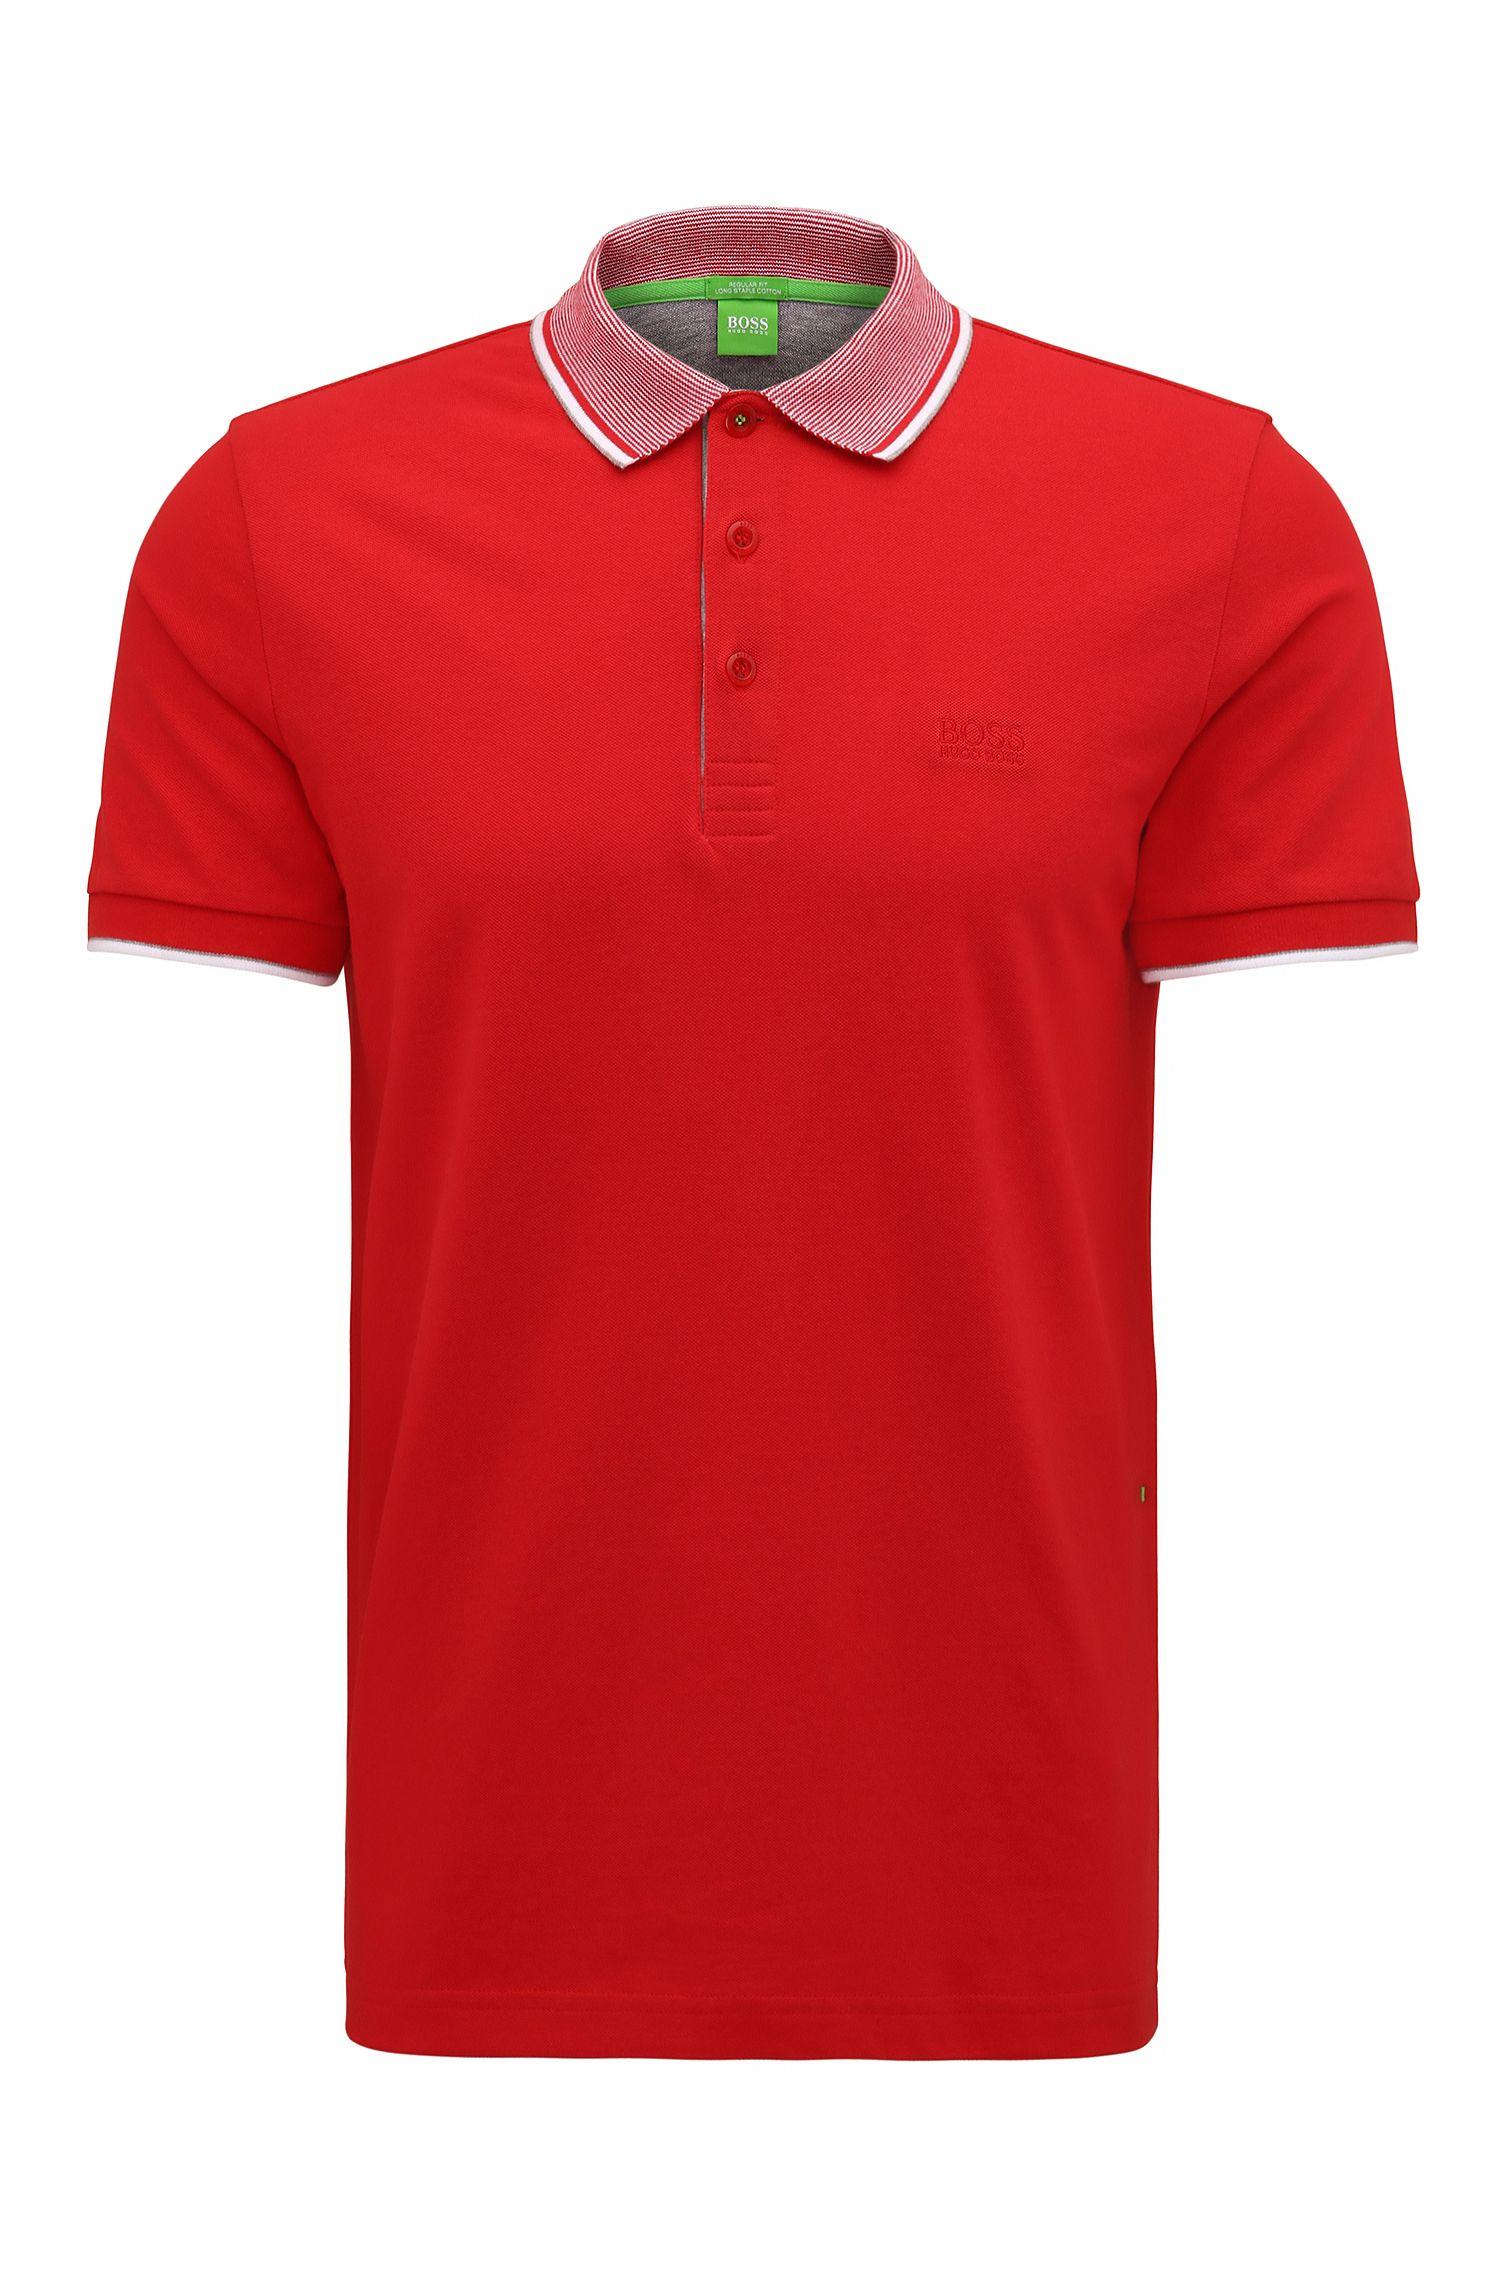 'Paddos' | Regular fit, Cotton Piqué Polo Shirt